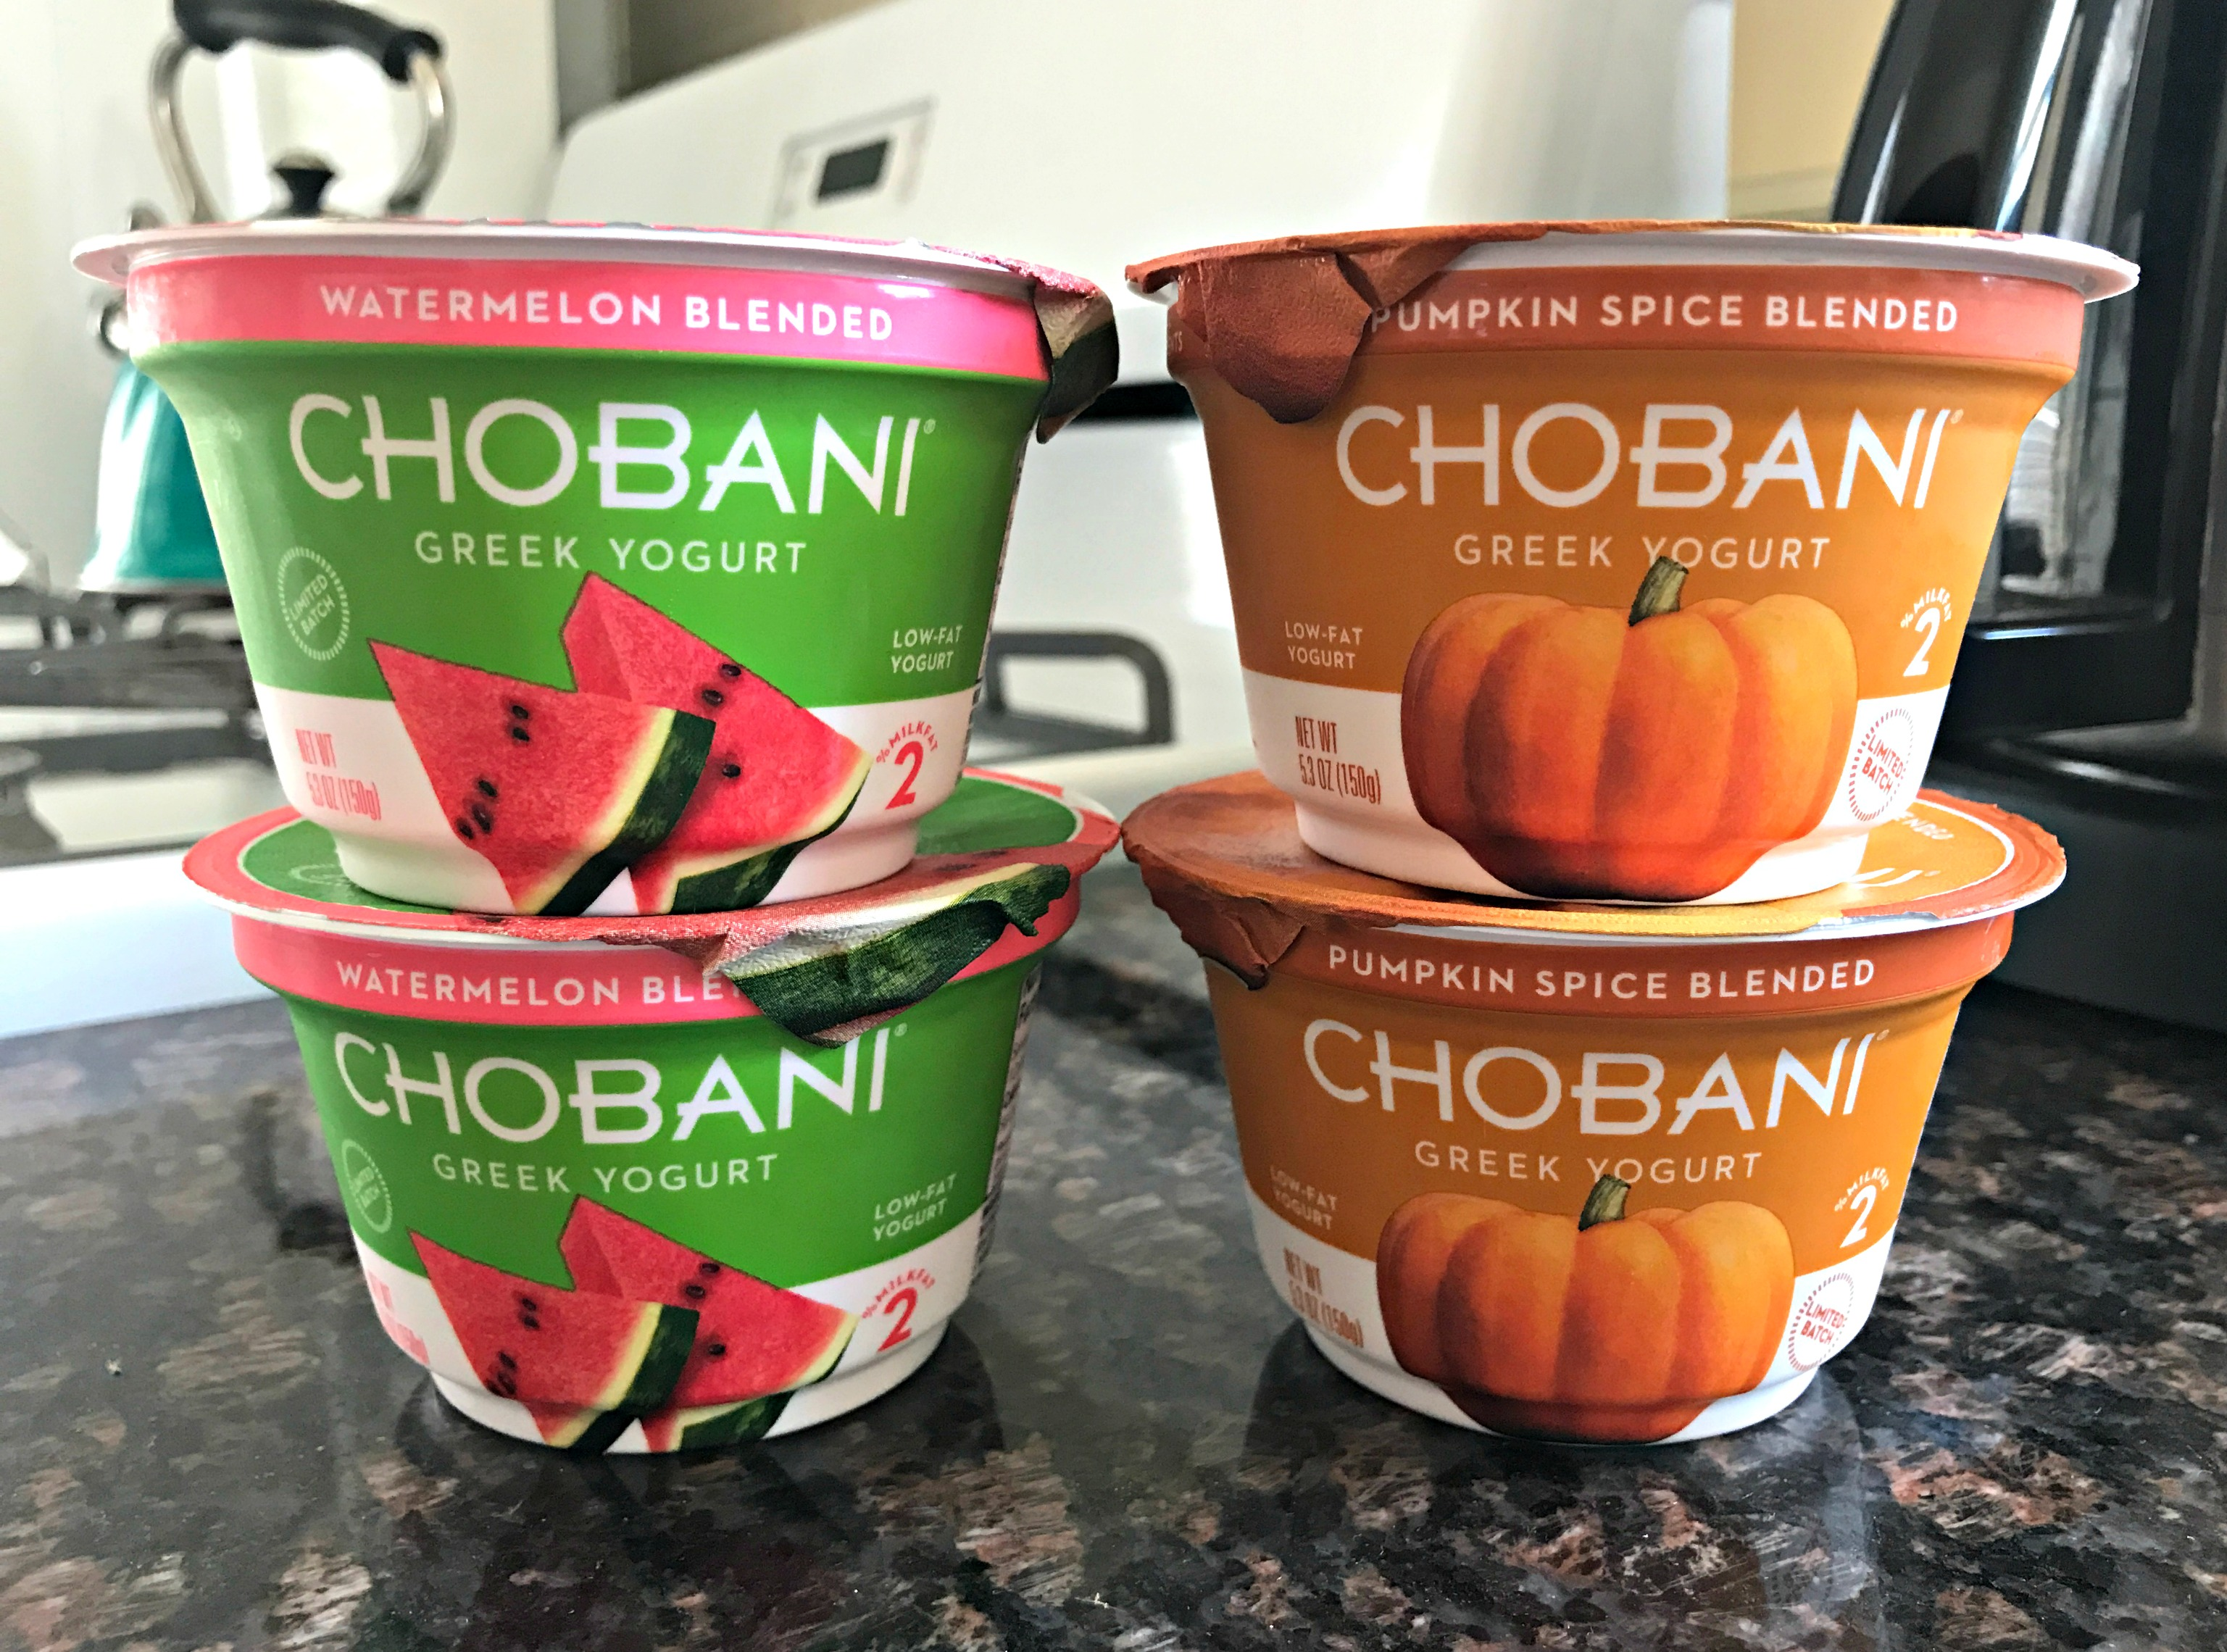 chobani watermelon and pumpkin spice blended greek yogurt